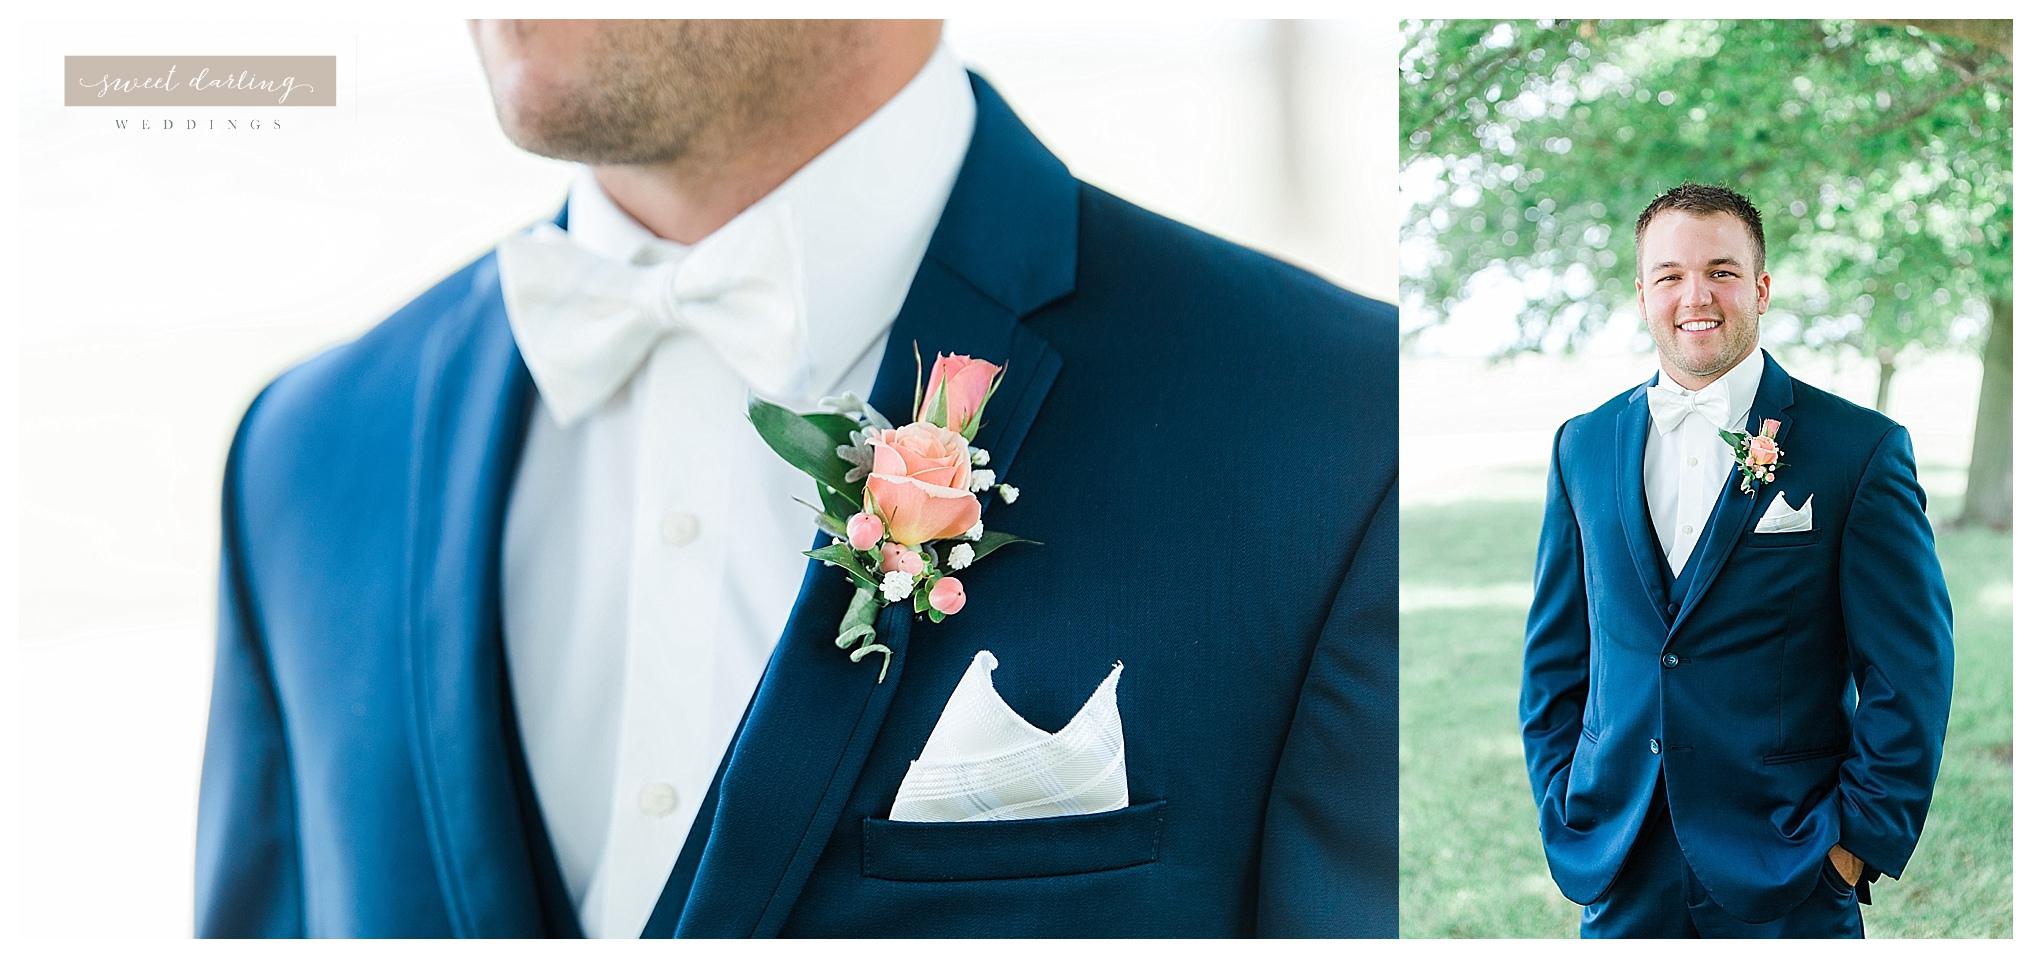 Paxton-illinois-engelbrecht-farmstead-romantic-wedding-photographer-sweet-darling-weddings_1204.jpg